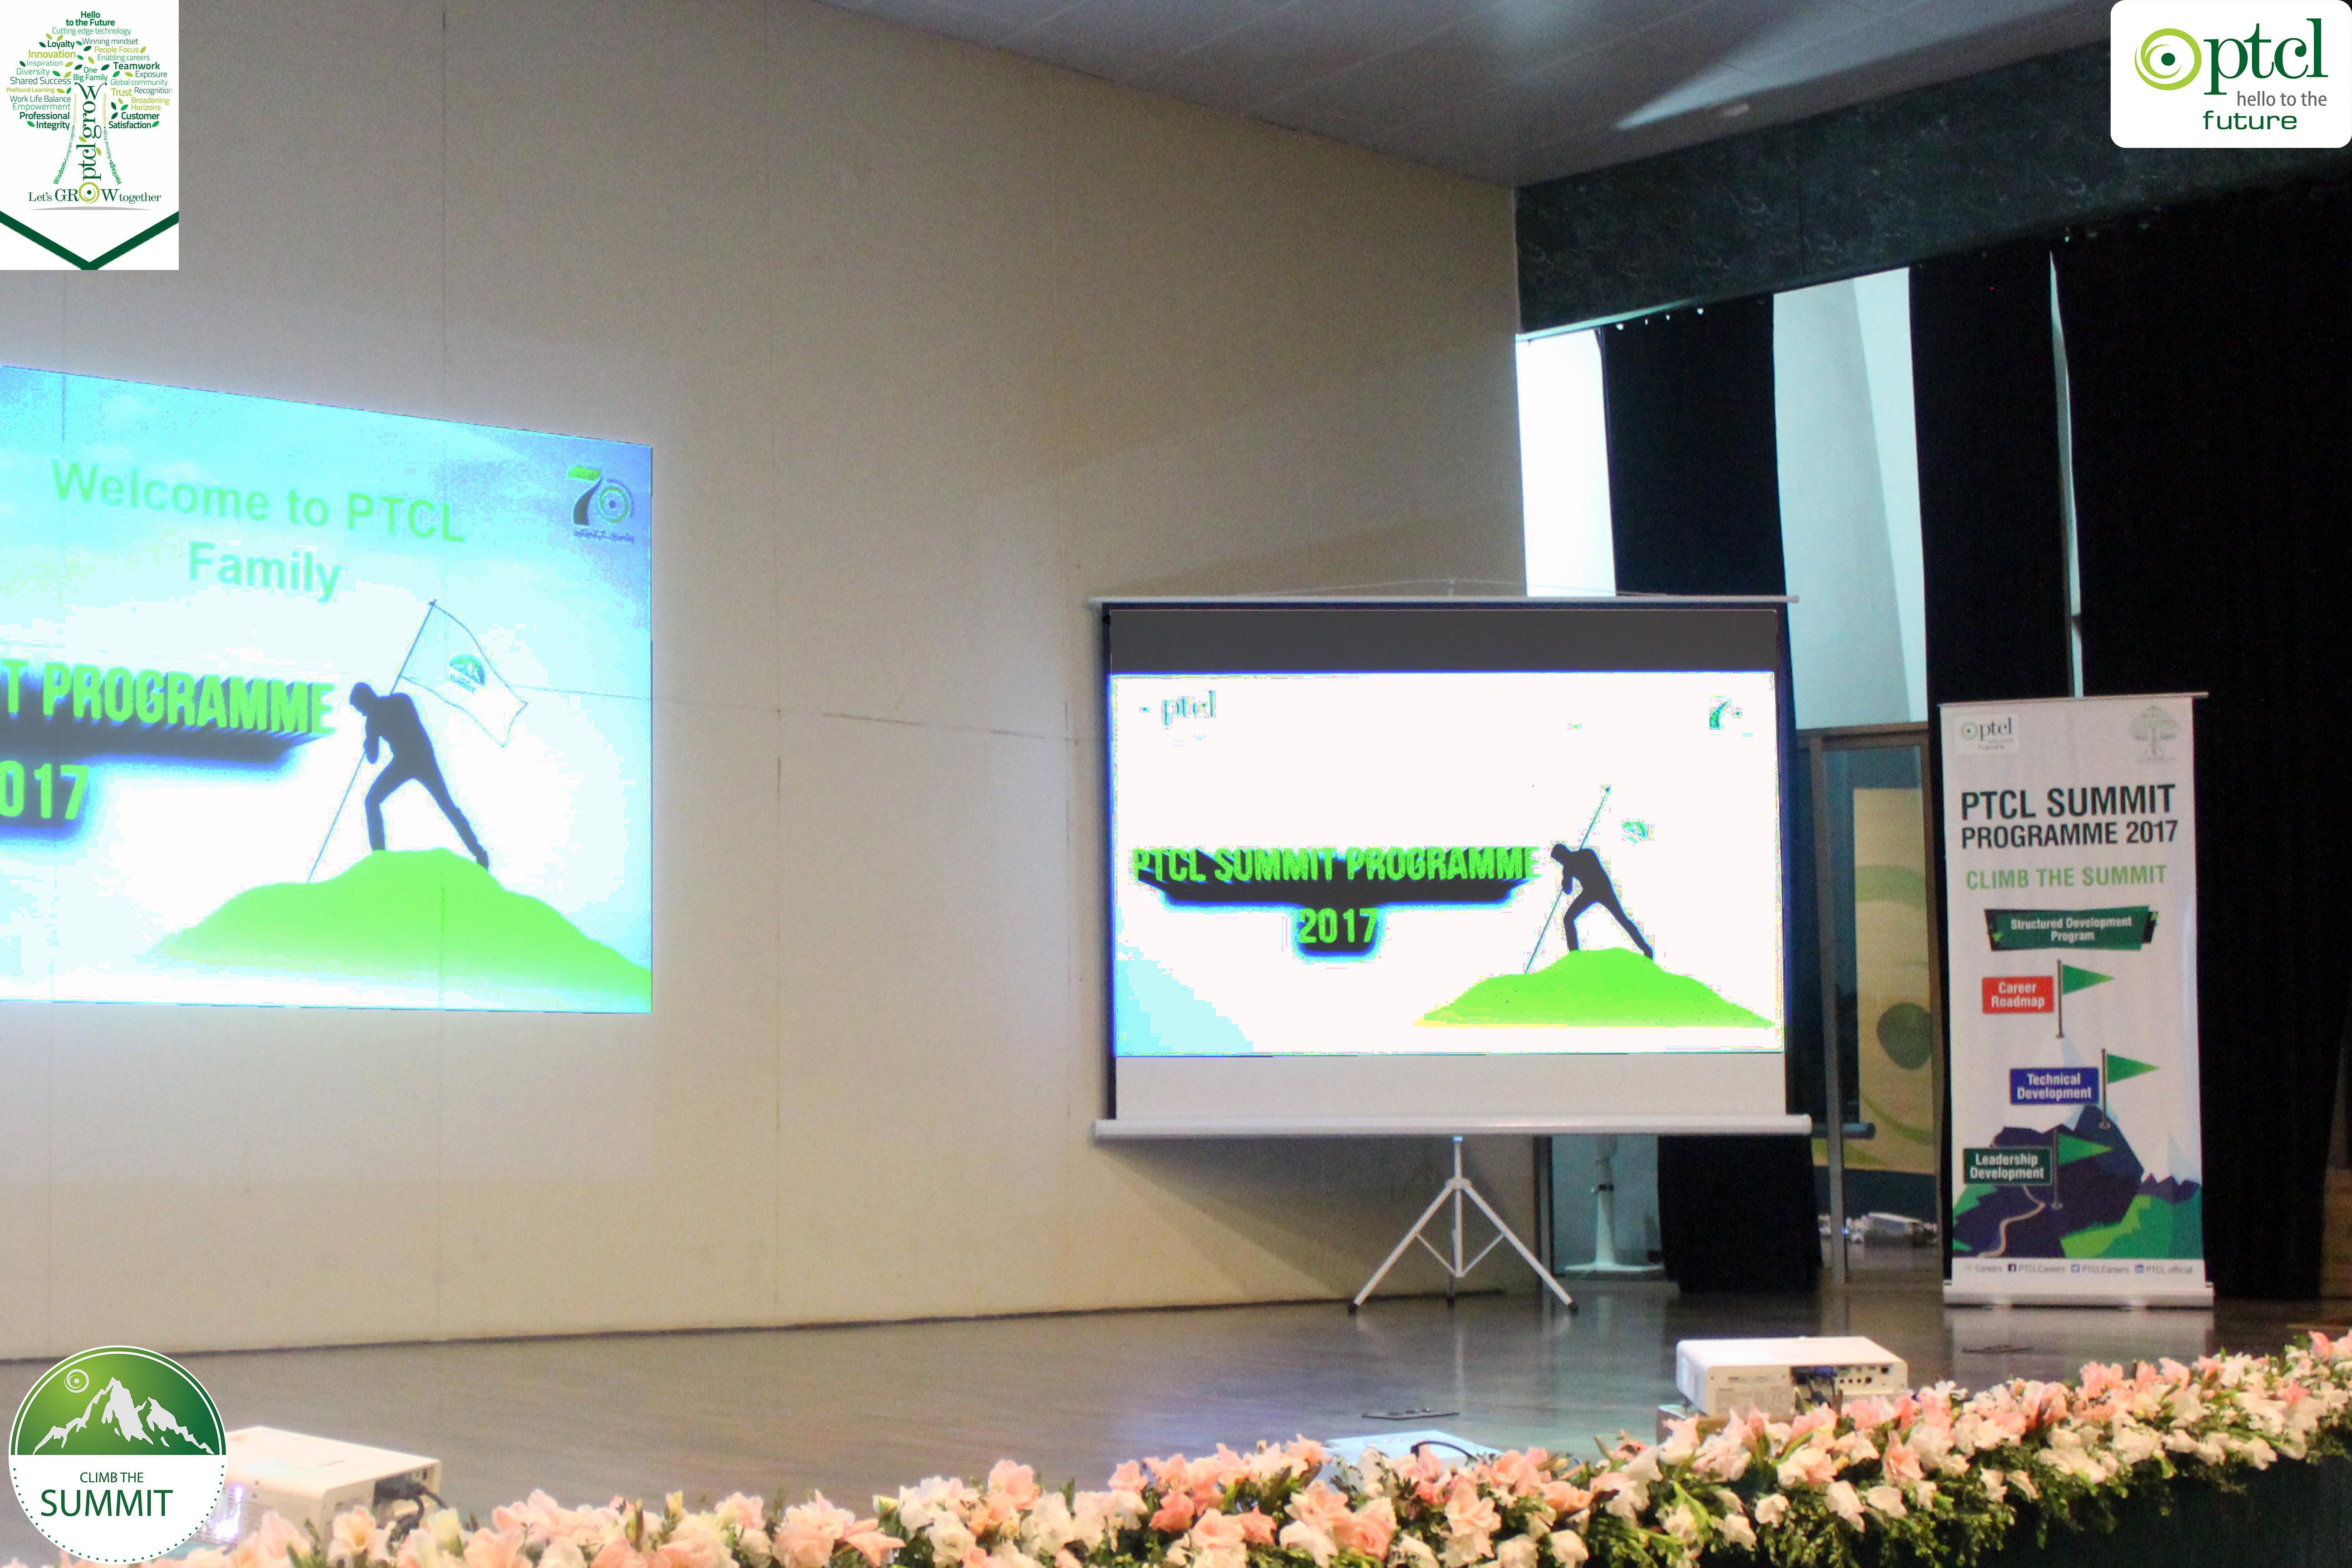 PTCL On-boards 150 Summiteers Under its Signature MT Programme 'Climb the Summit'